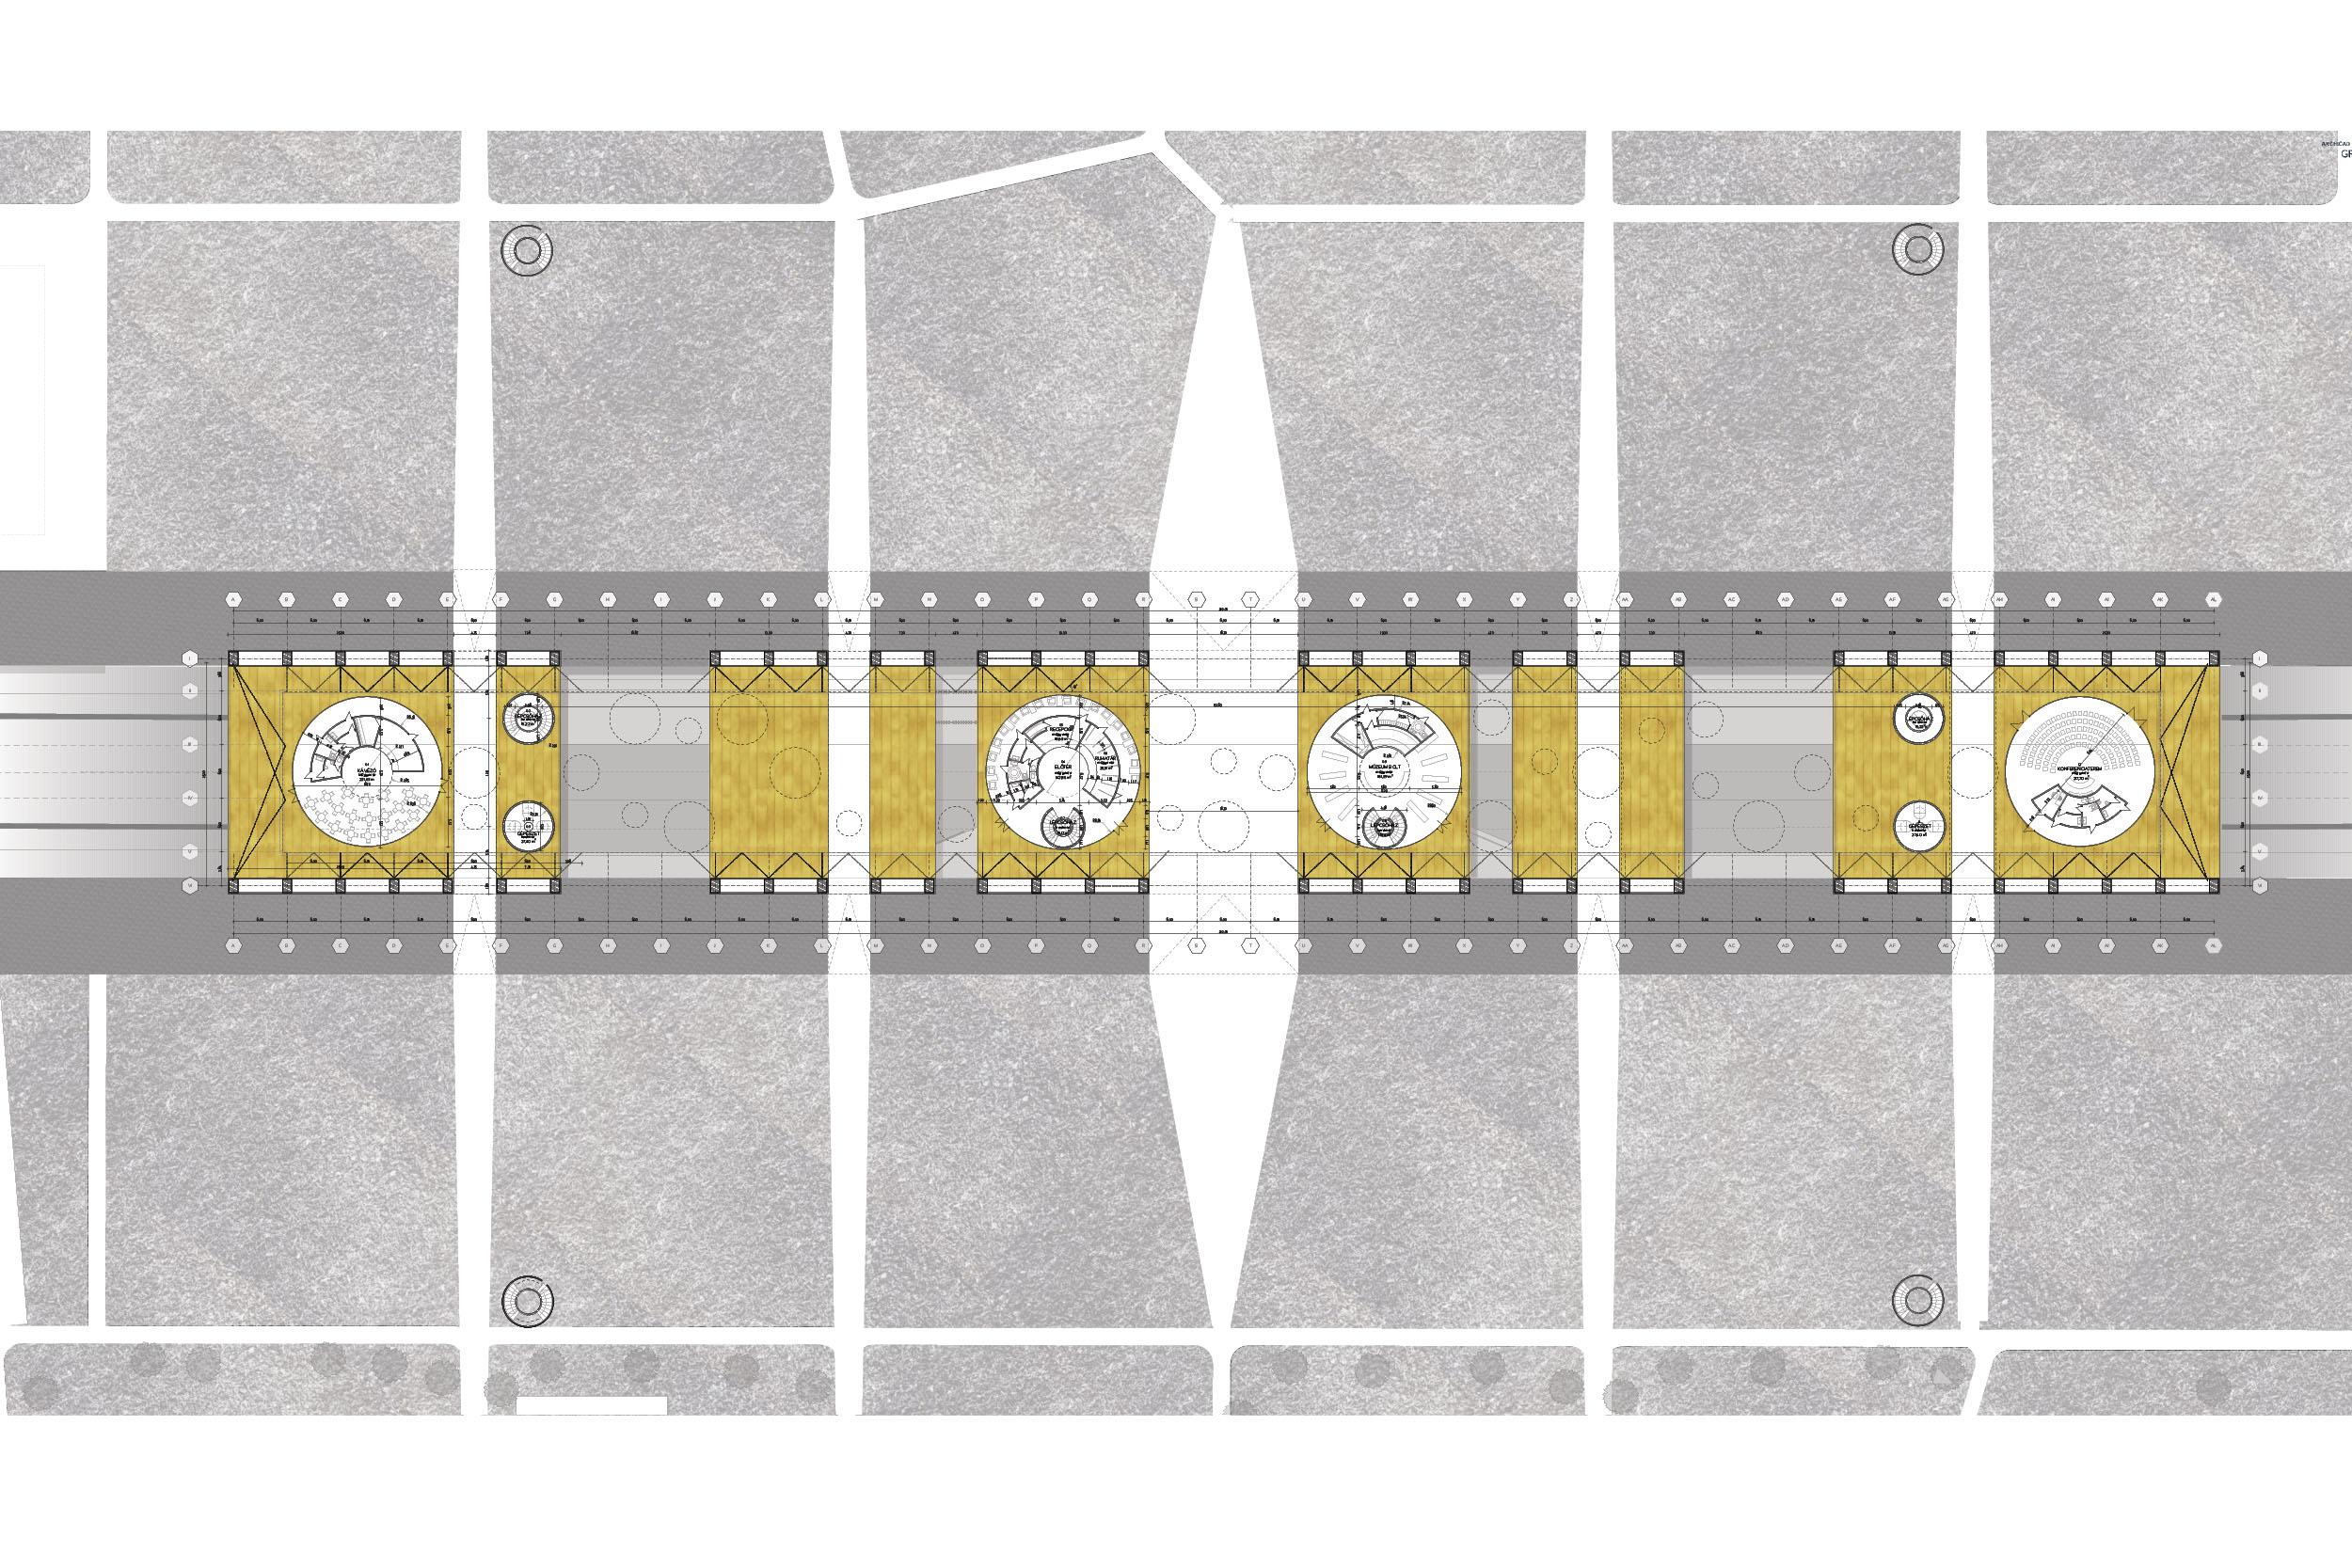 Szemerey-Daniel-ESA-Museum-Hellodesign-15.jpg